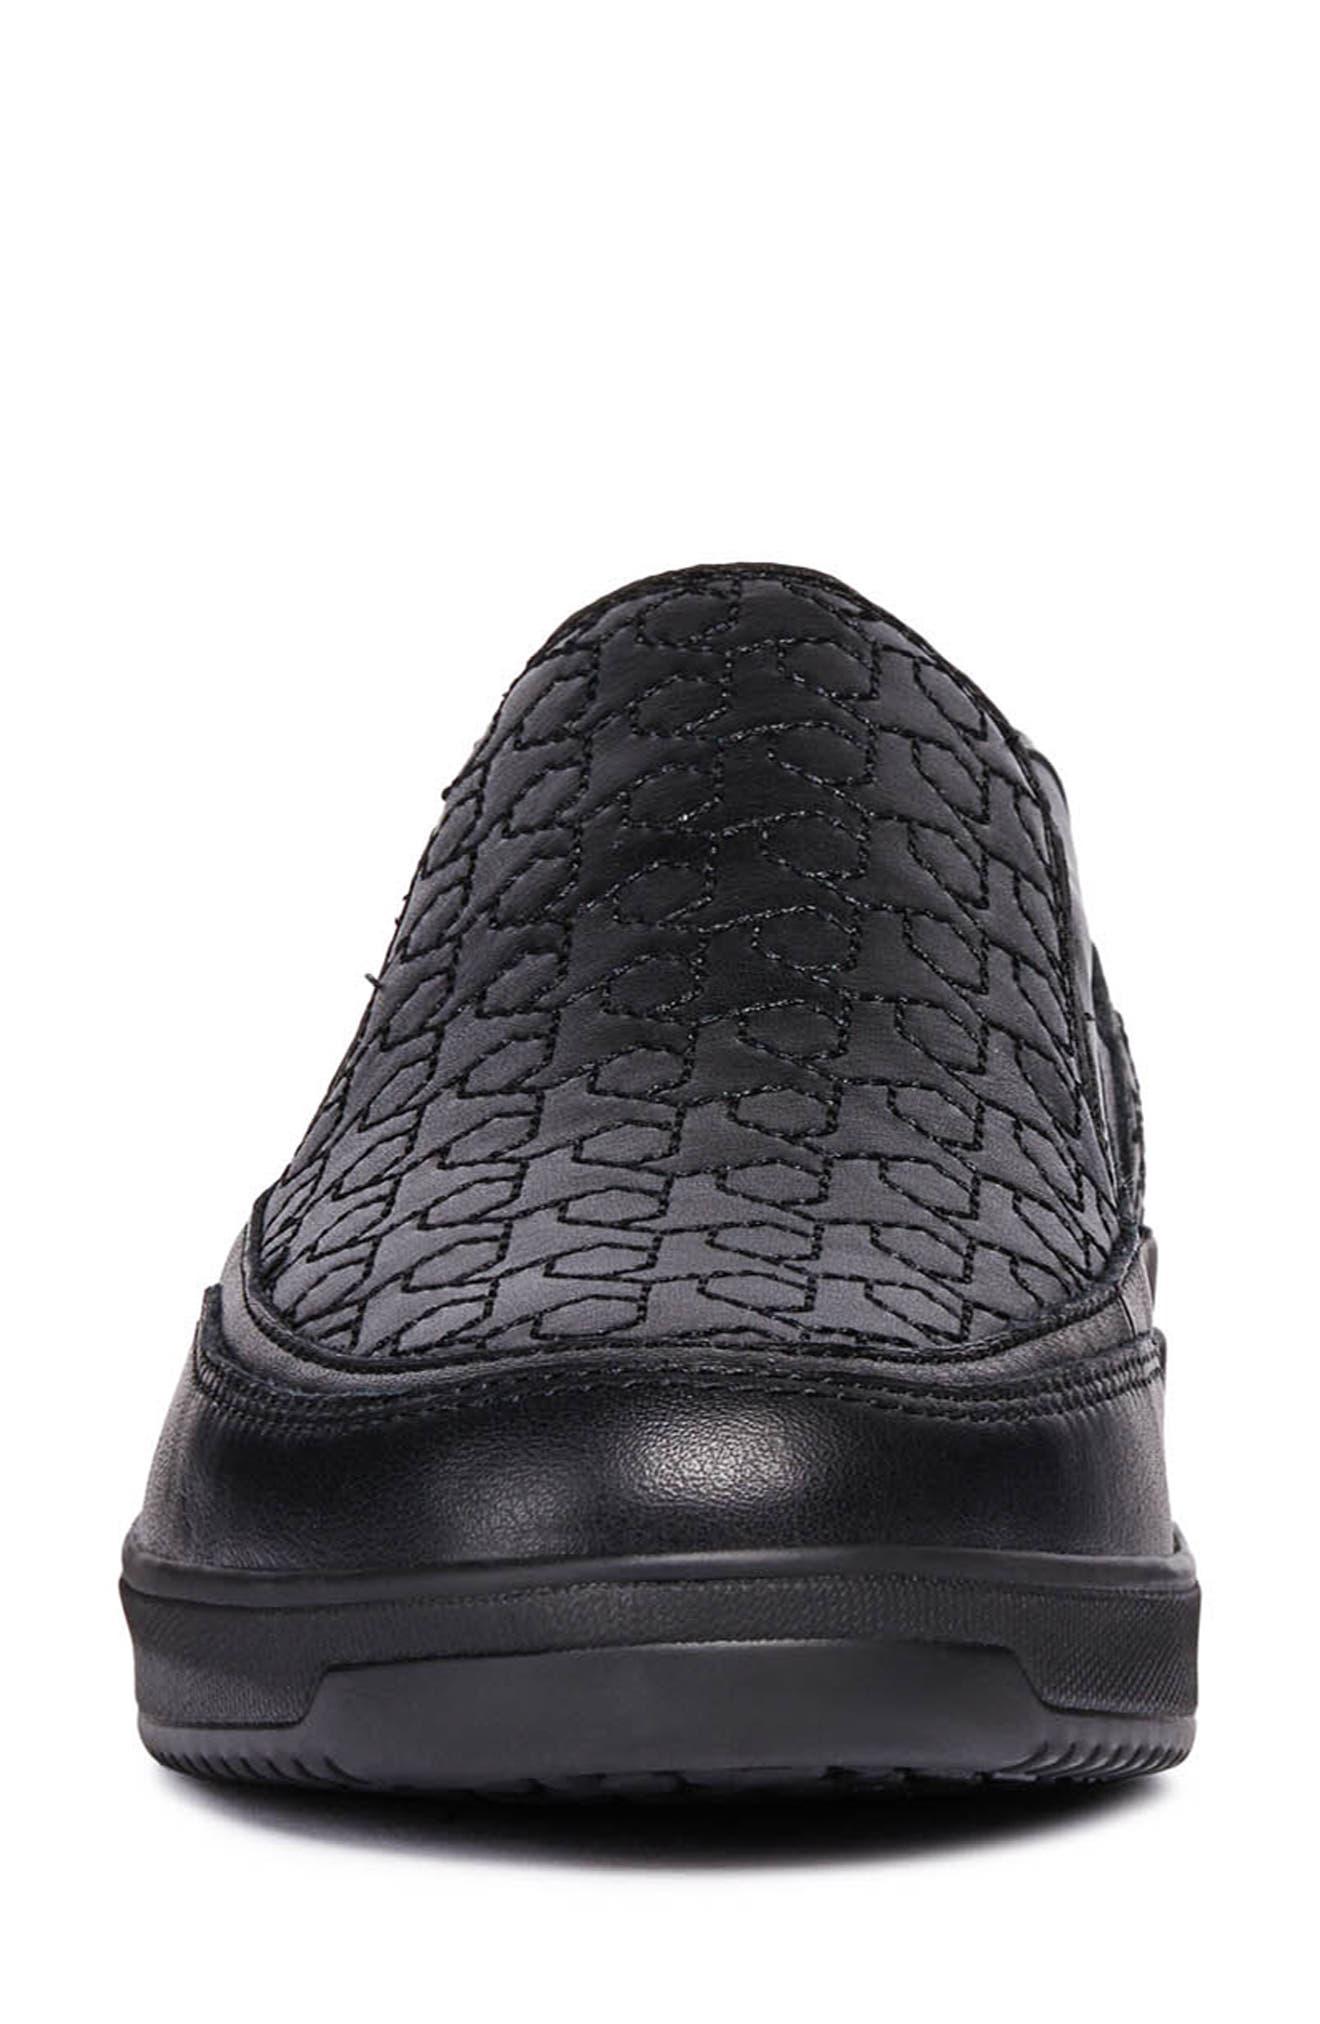 Tahina Slip-On Sneaker,                             Alternate thumbnail 4, color,                             BLACK FABRIC